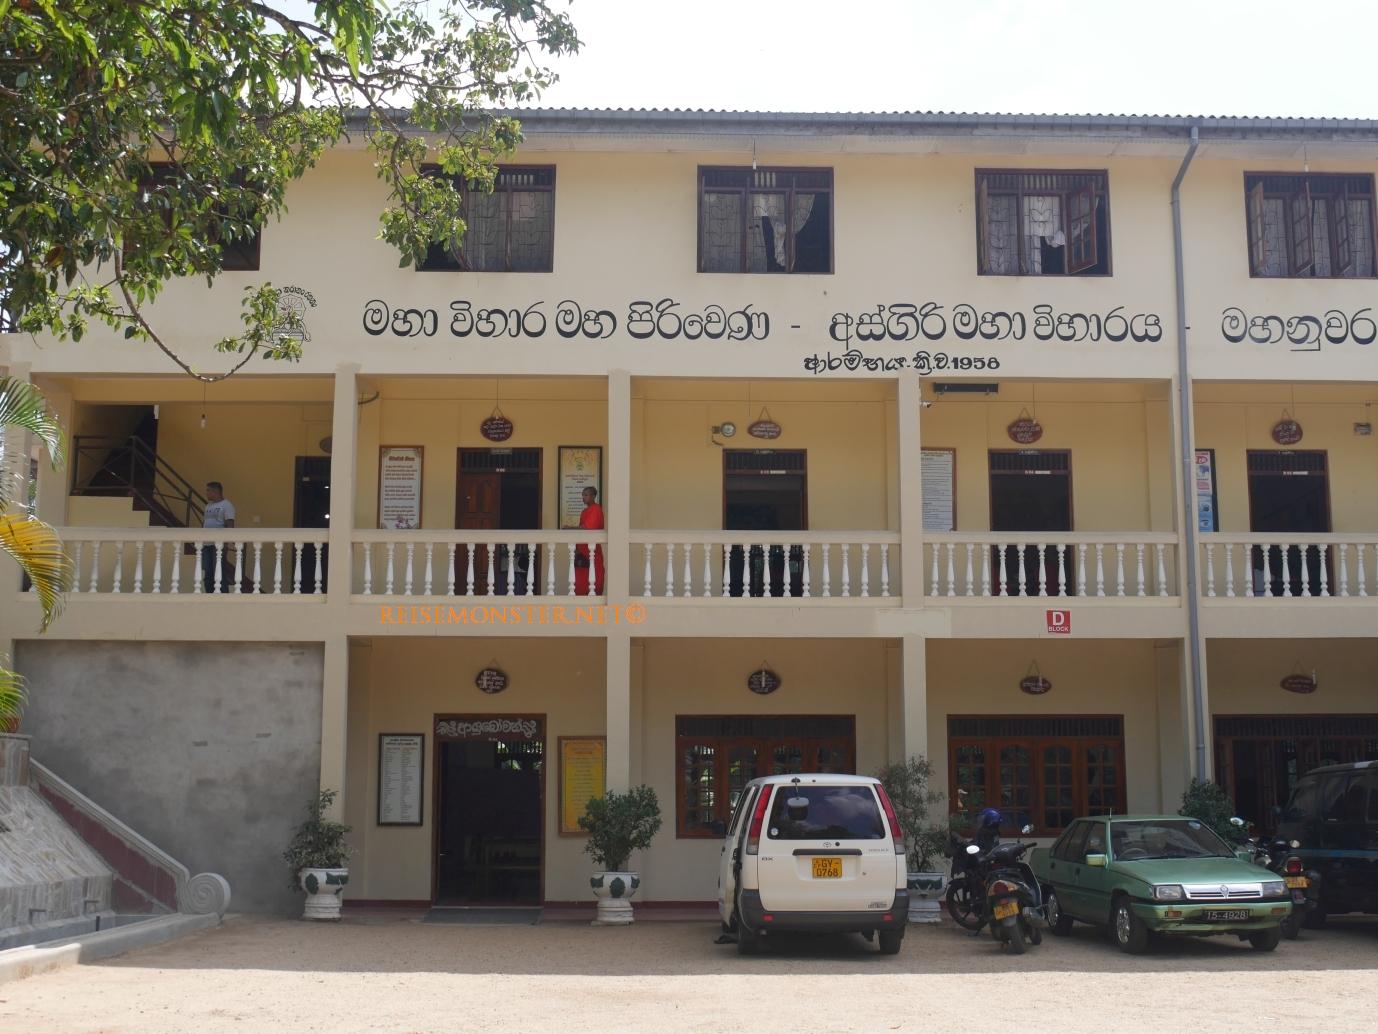 monk_school_kandy_Jan_2017__002